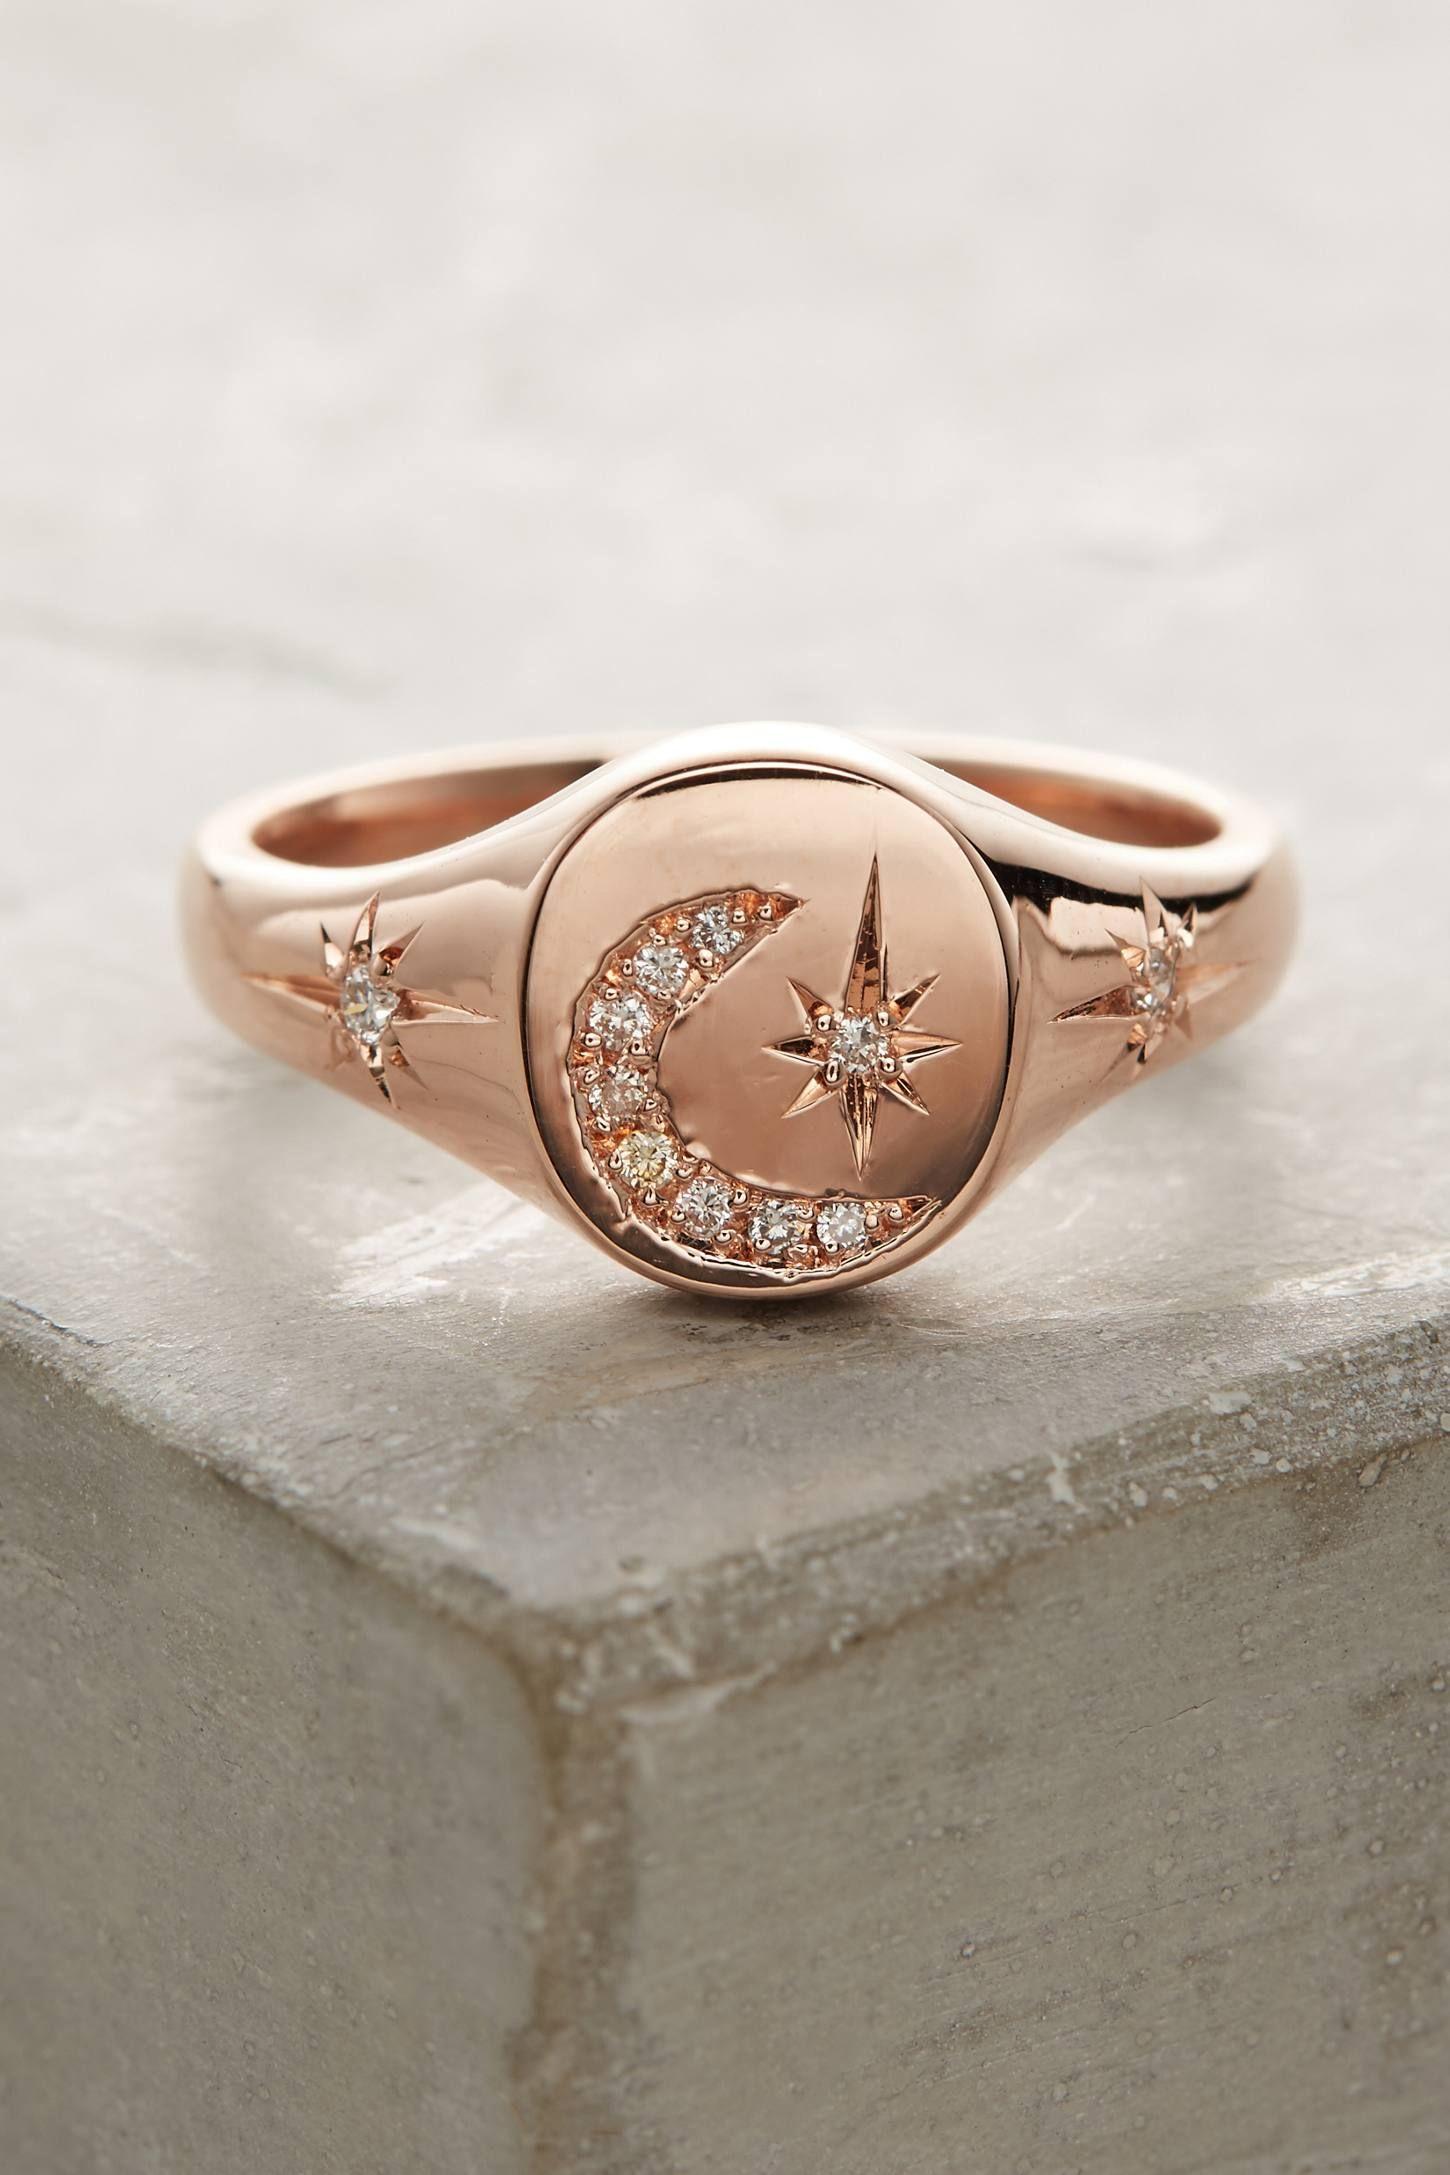 Slide View: 2: Moon & Stars Diamond Signet Ring